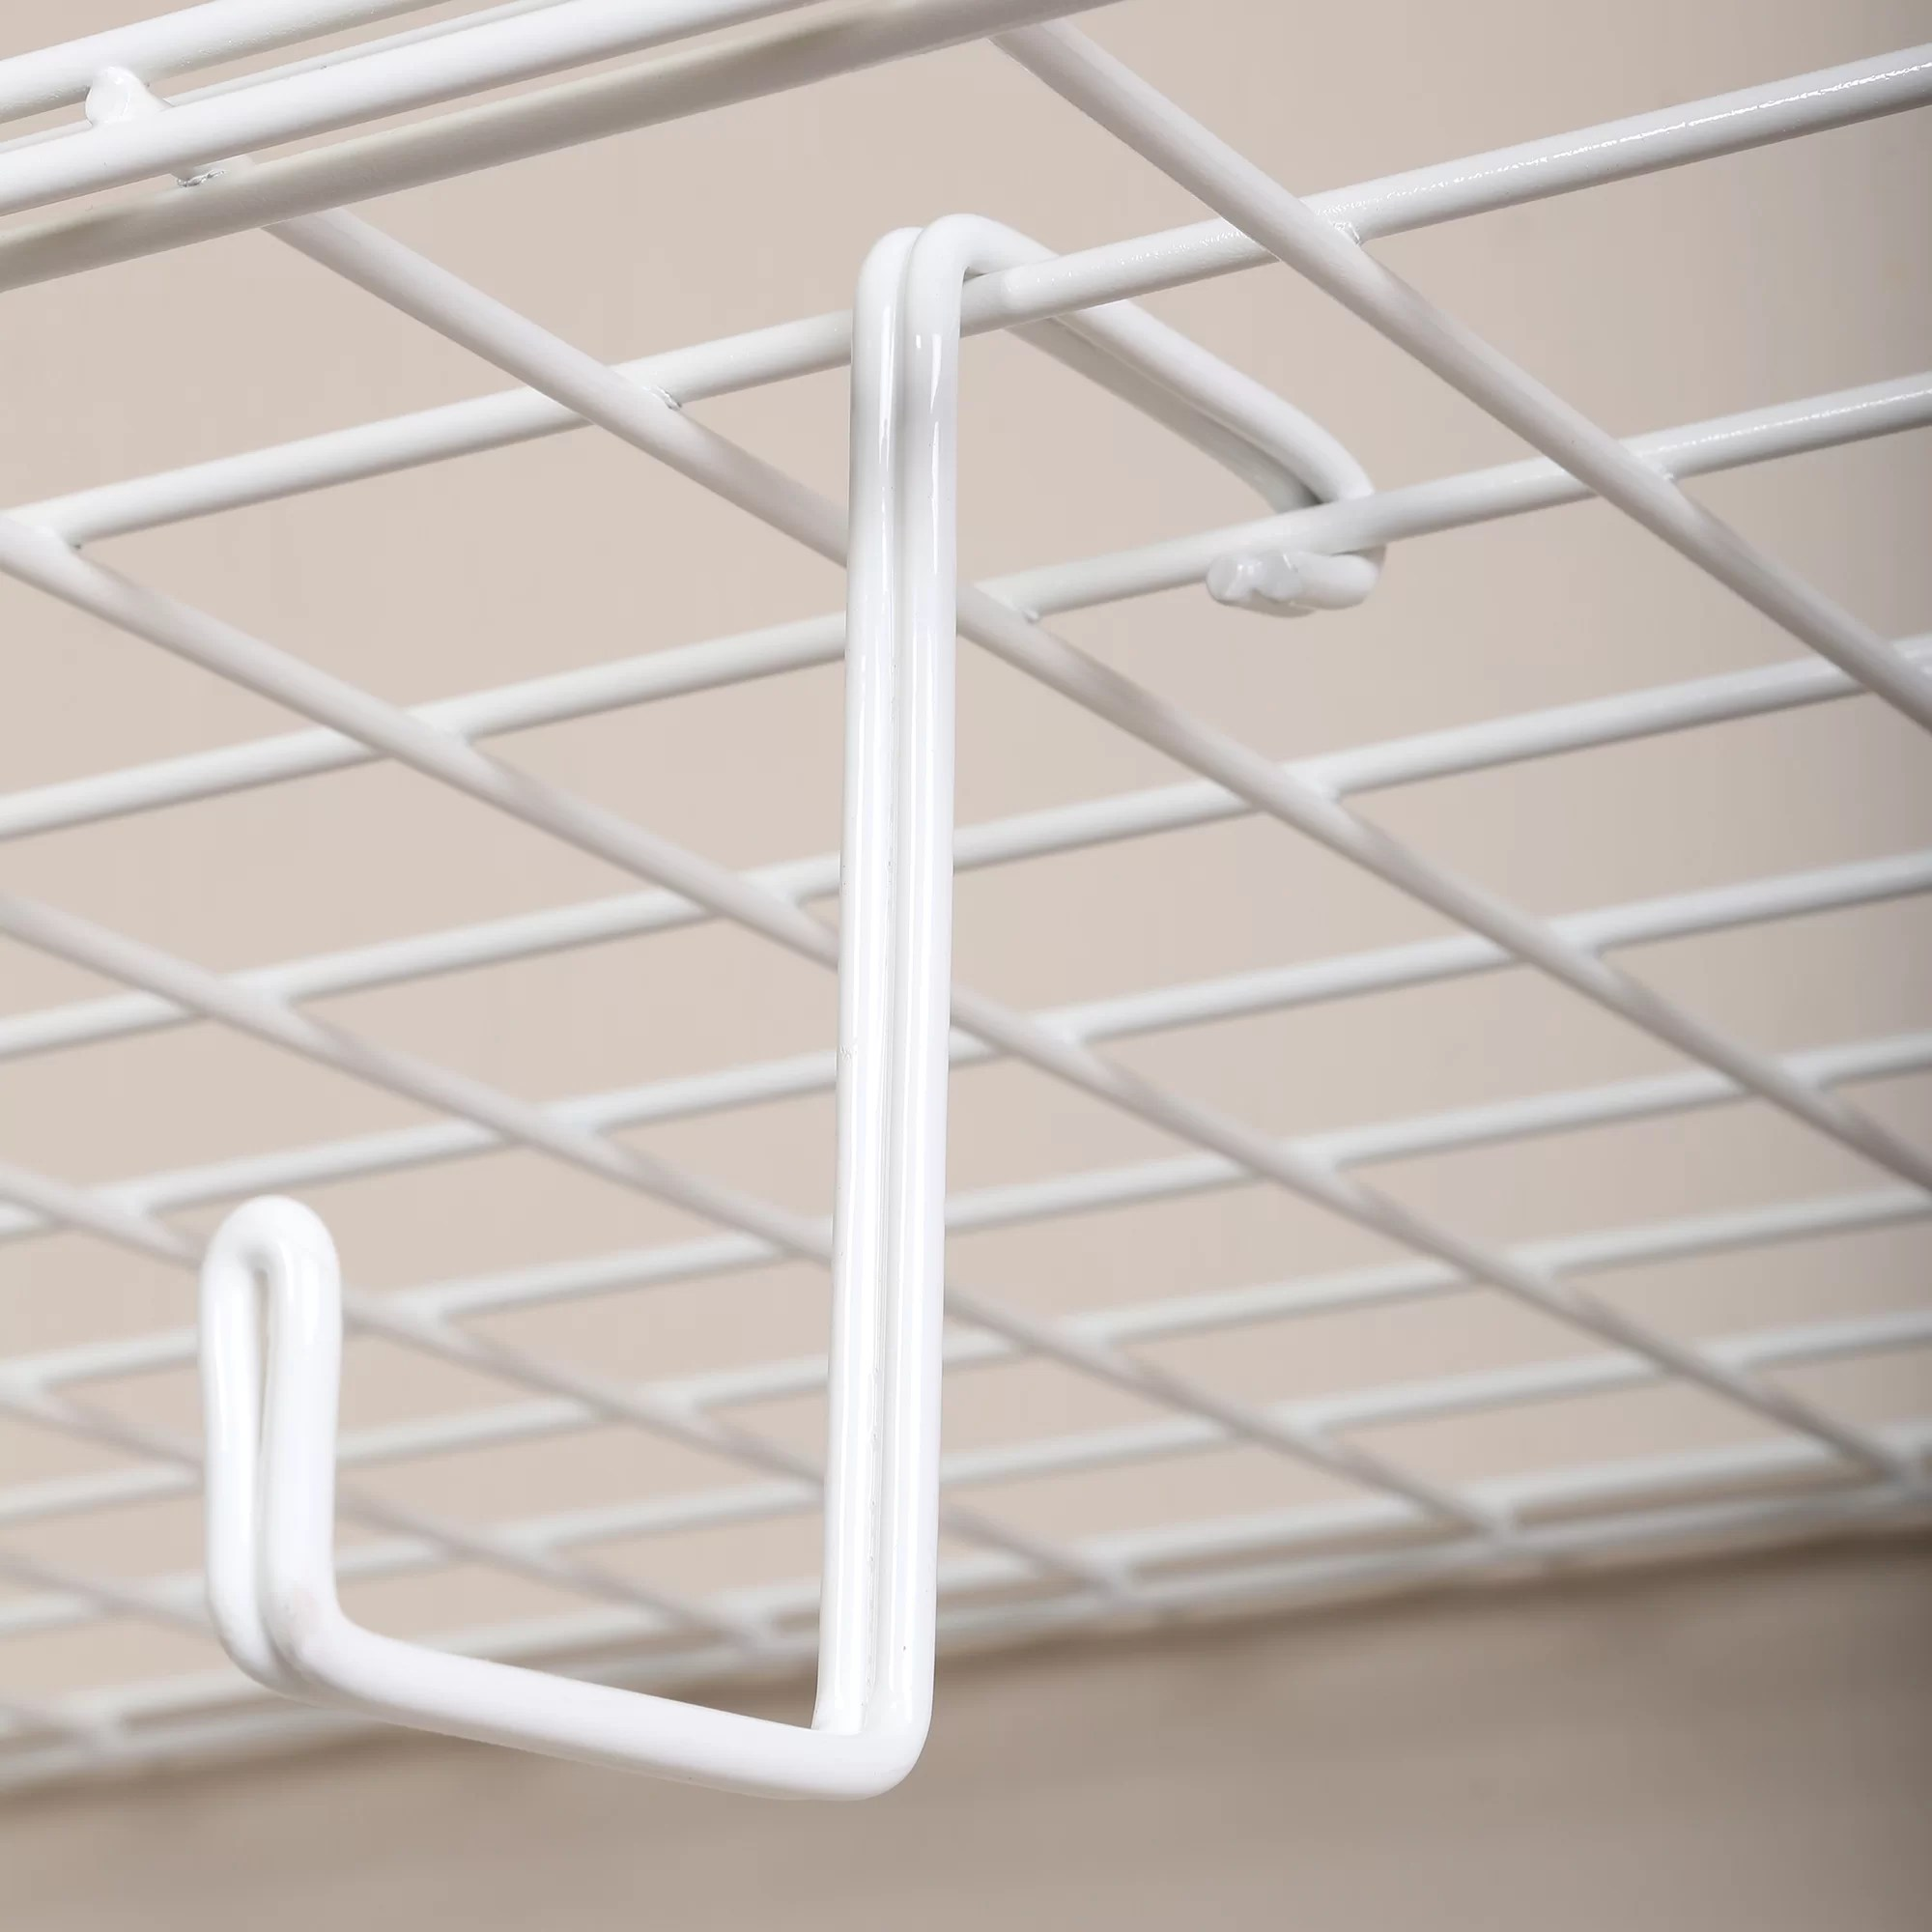 z hook ceiling mounted bike rack